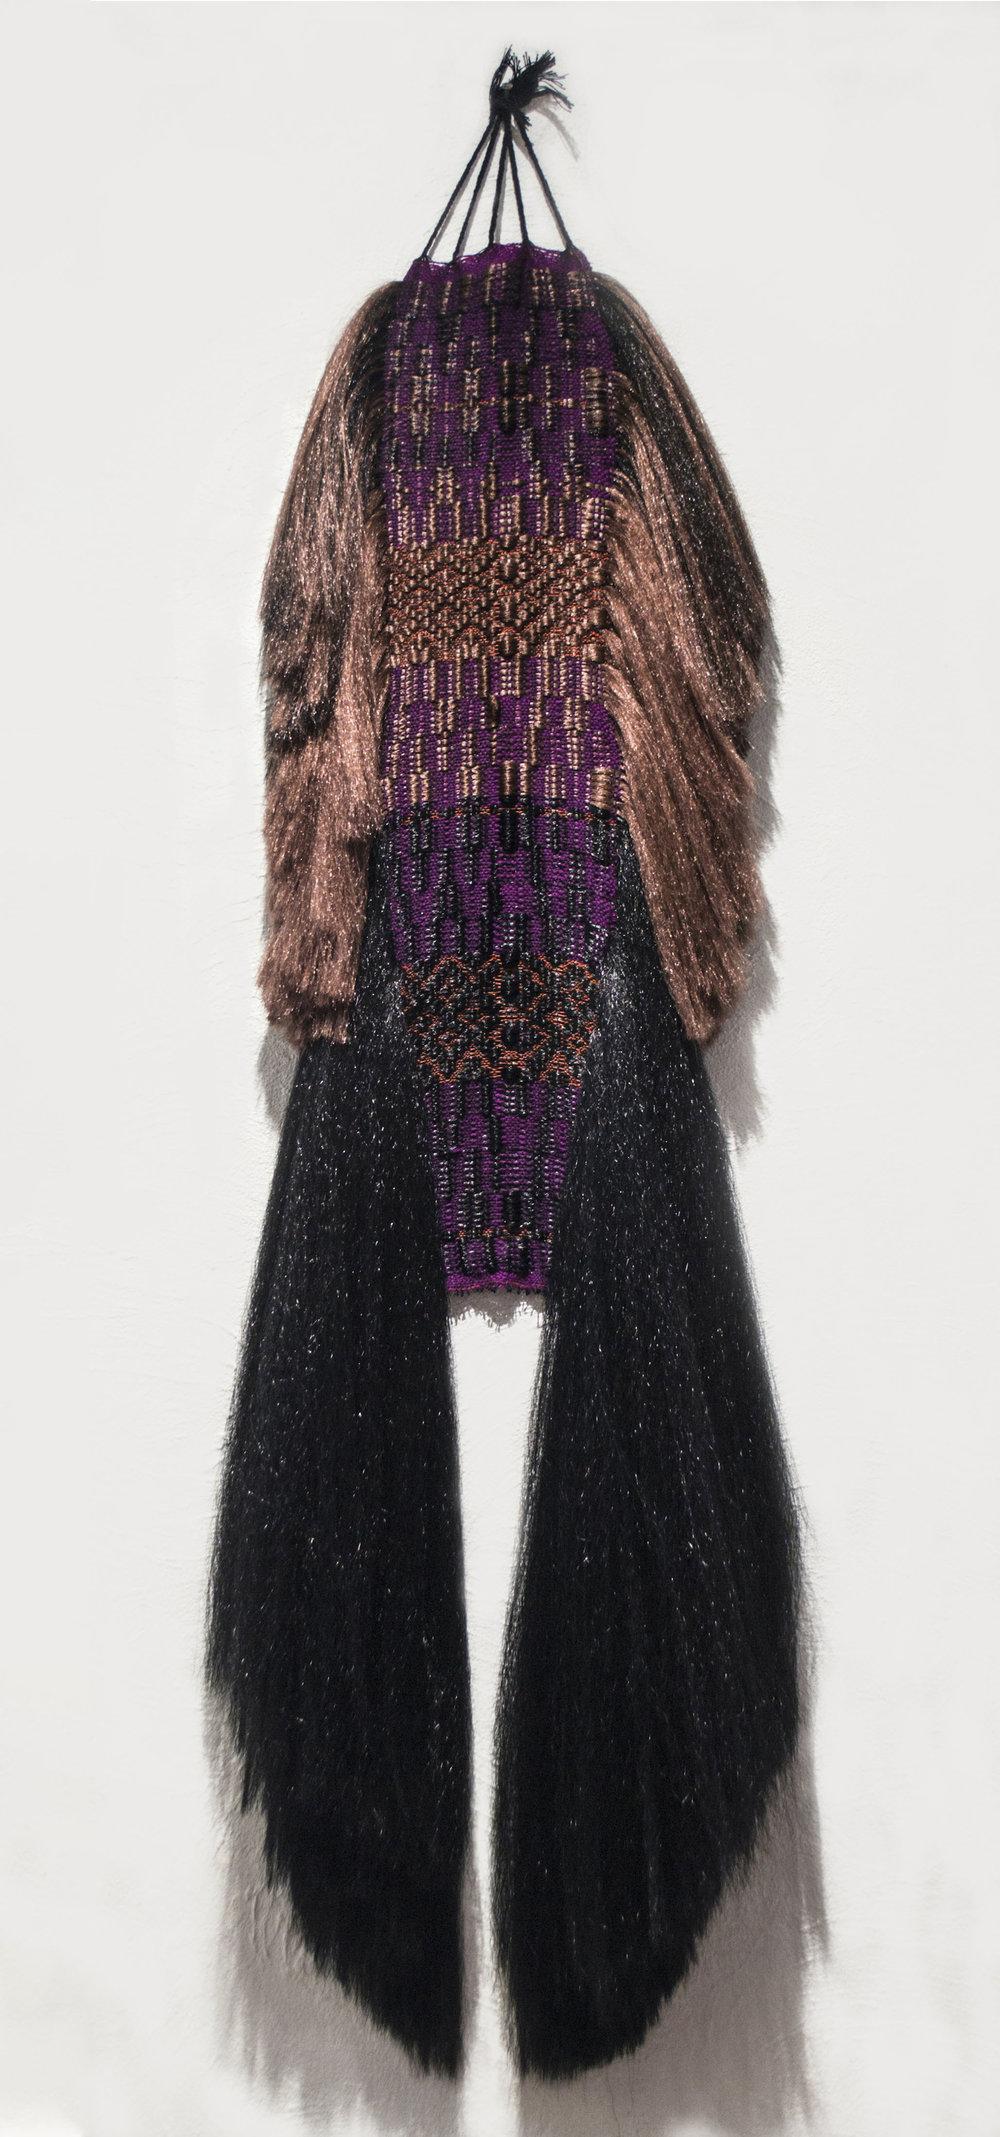 Dia-Triangular  2014, Cotton and synthetic hair, Photographer: Sylvia Abisaab SOLD